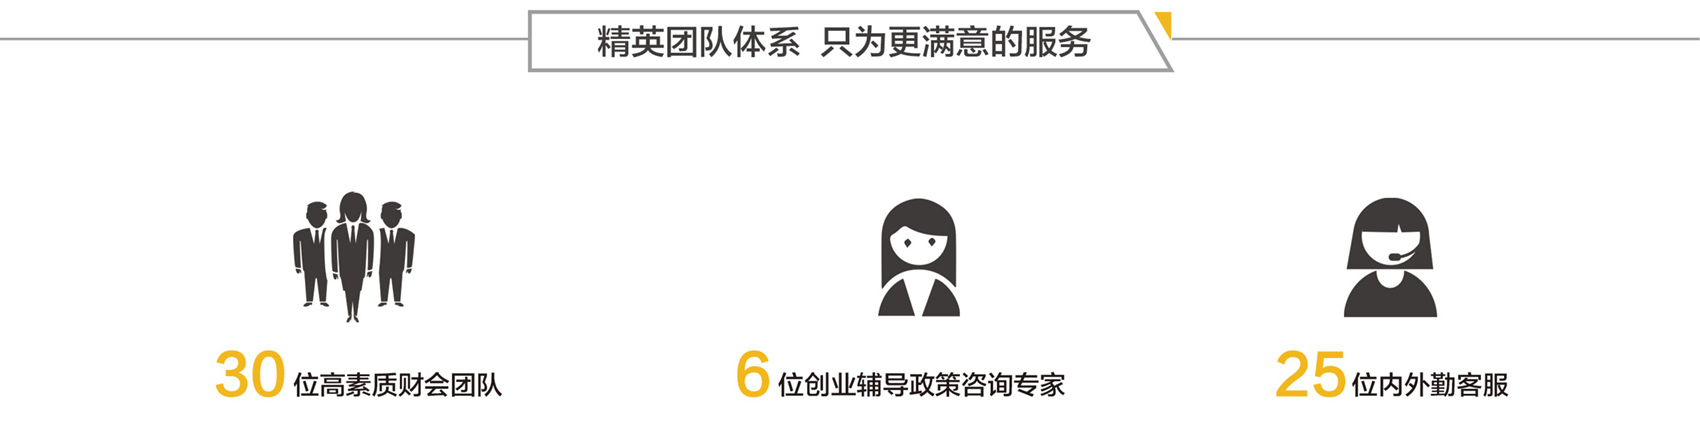 产品页demo_03.jpg